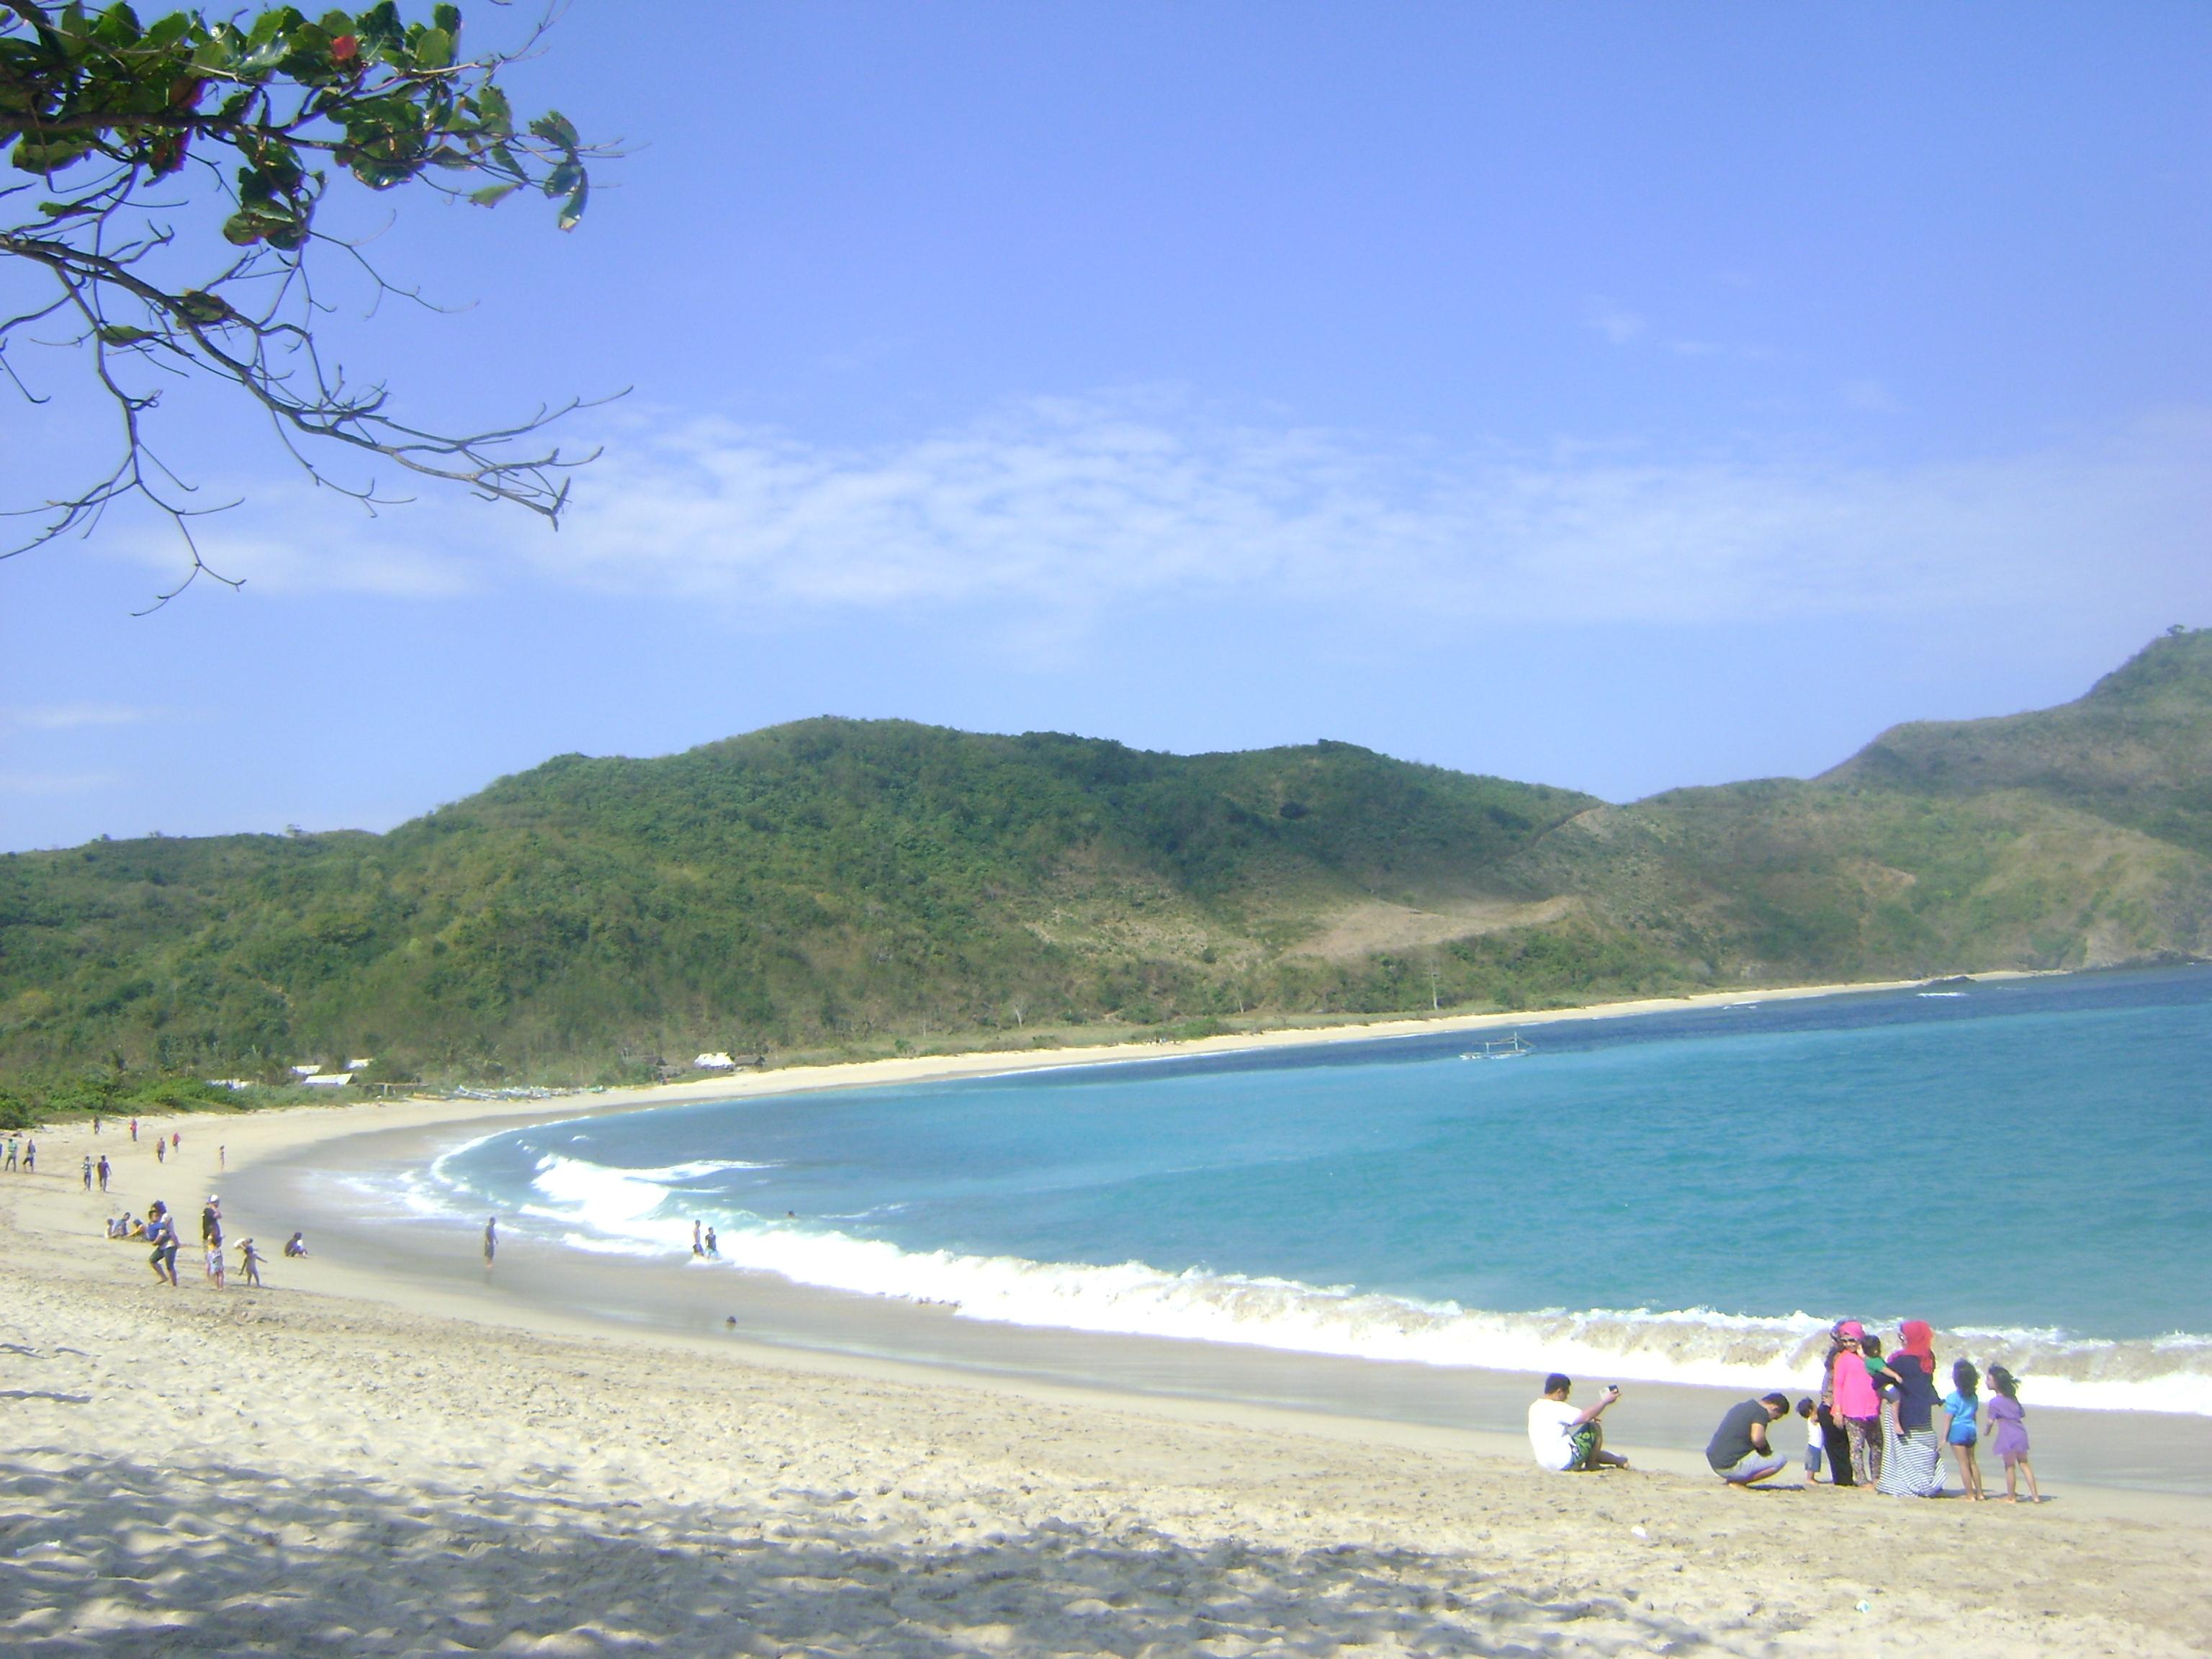 Wow!! Ini namanya Pantai Mawun di Lombok Tengah.. Masya Allah itu lautnya warna hijau kebiruannn.. bener2 bikin kami semua takjub..